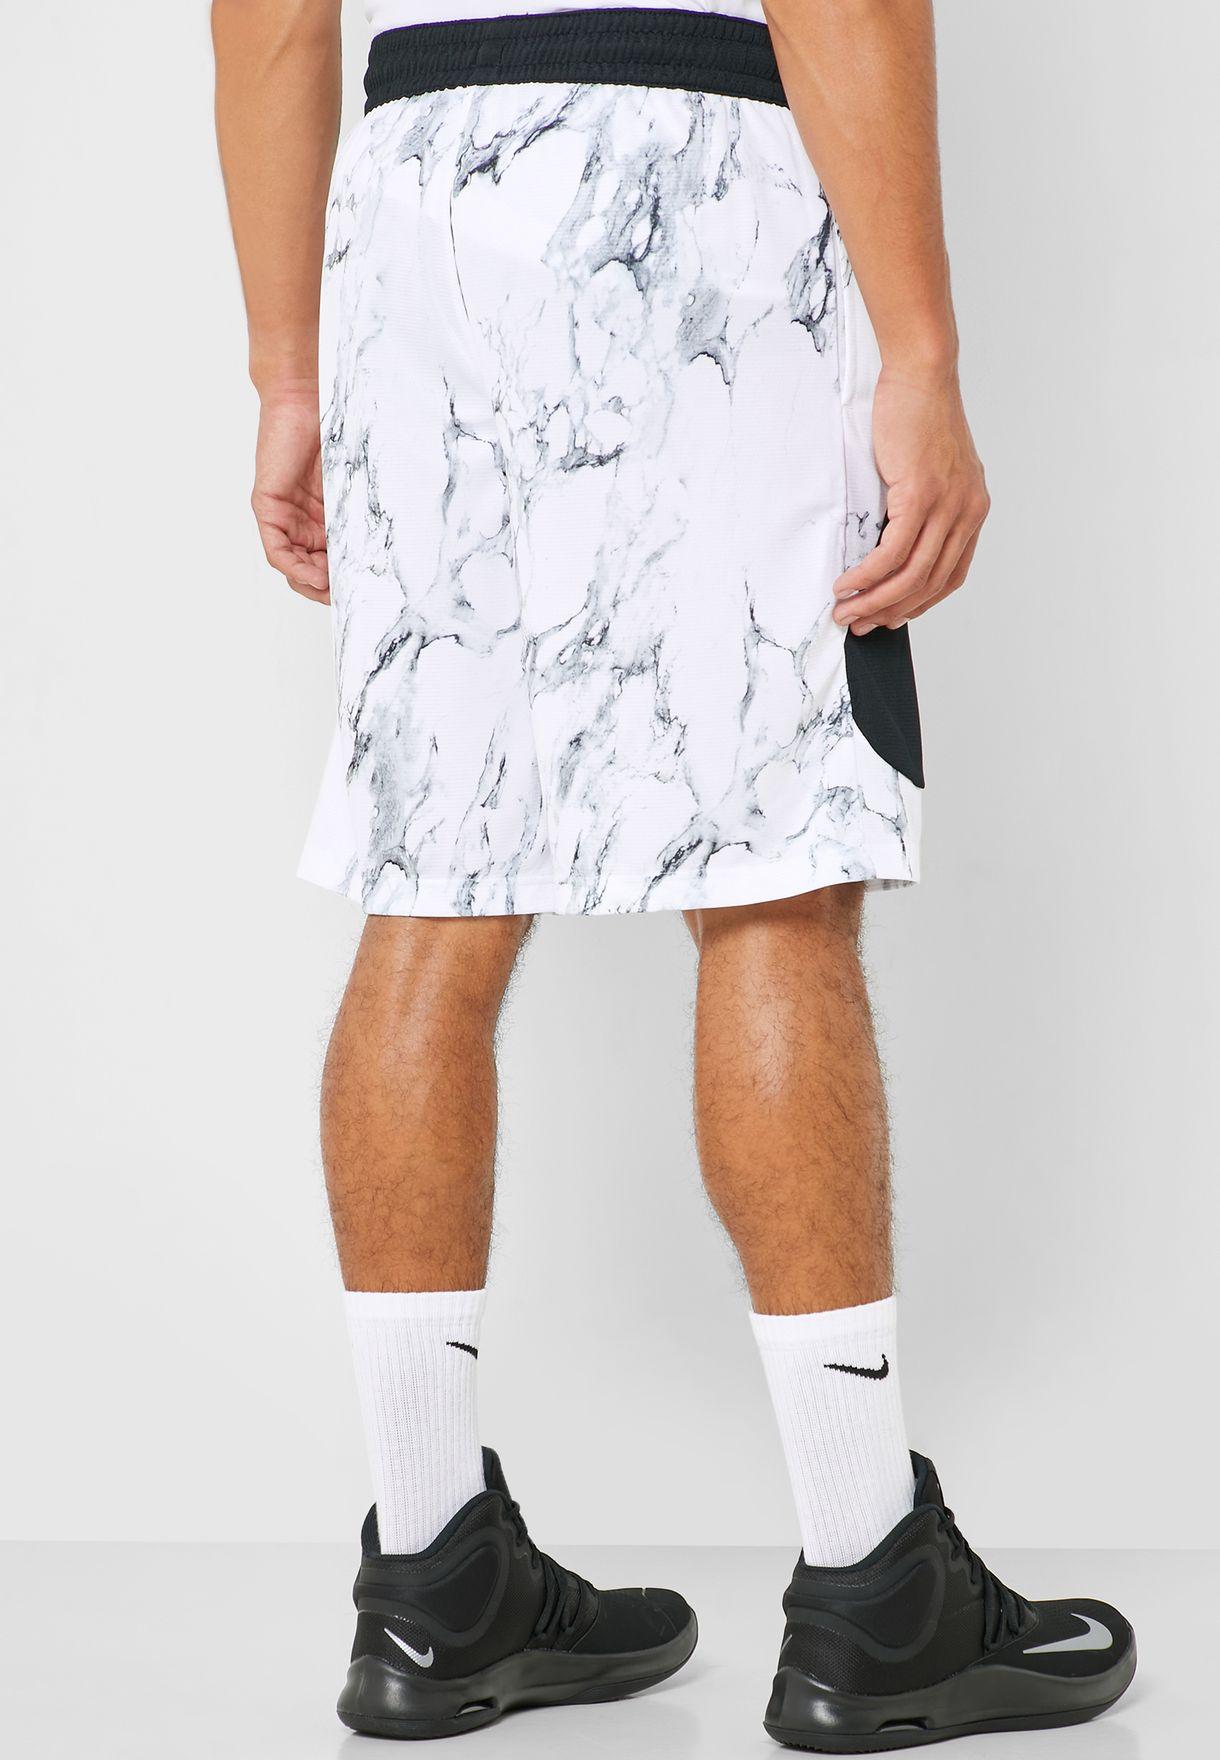 Marble Shorts